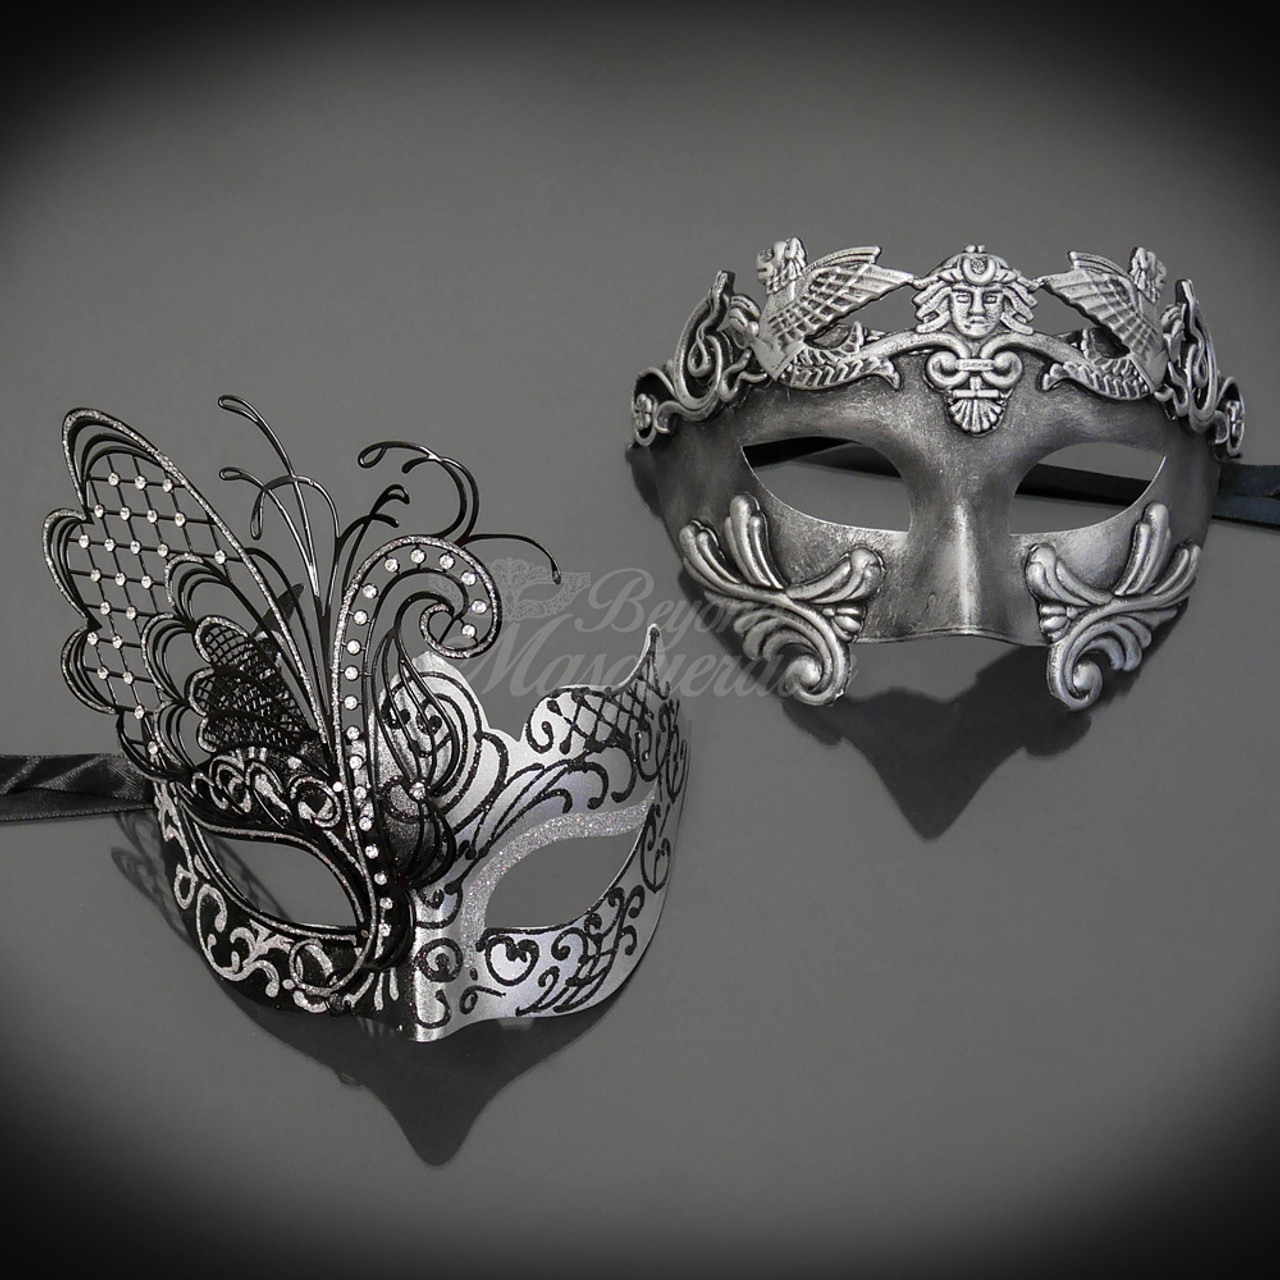 M6107 Couples Masquerade Red Silver M6131 Couple Masquerade Mask Set